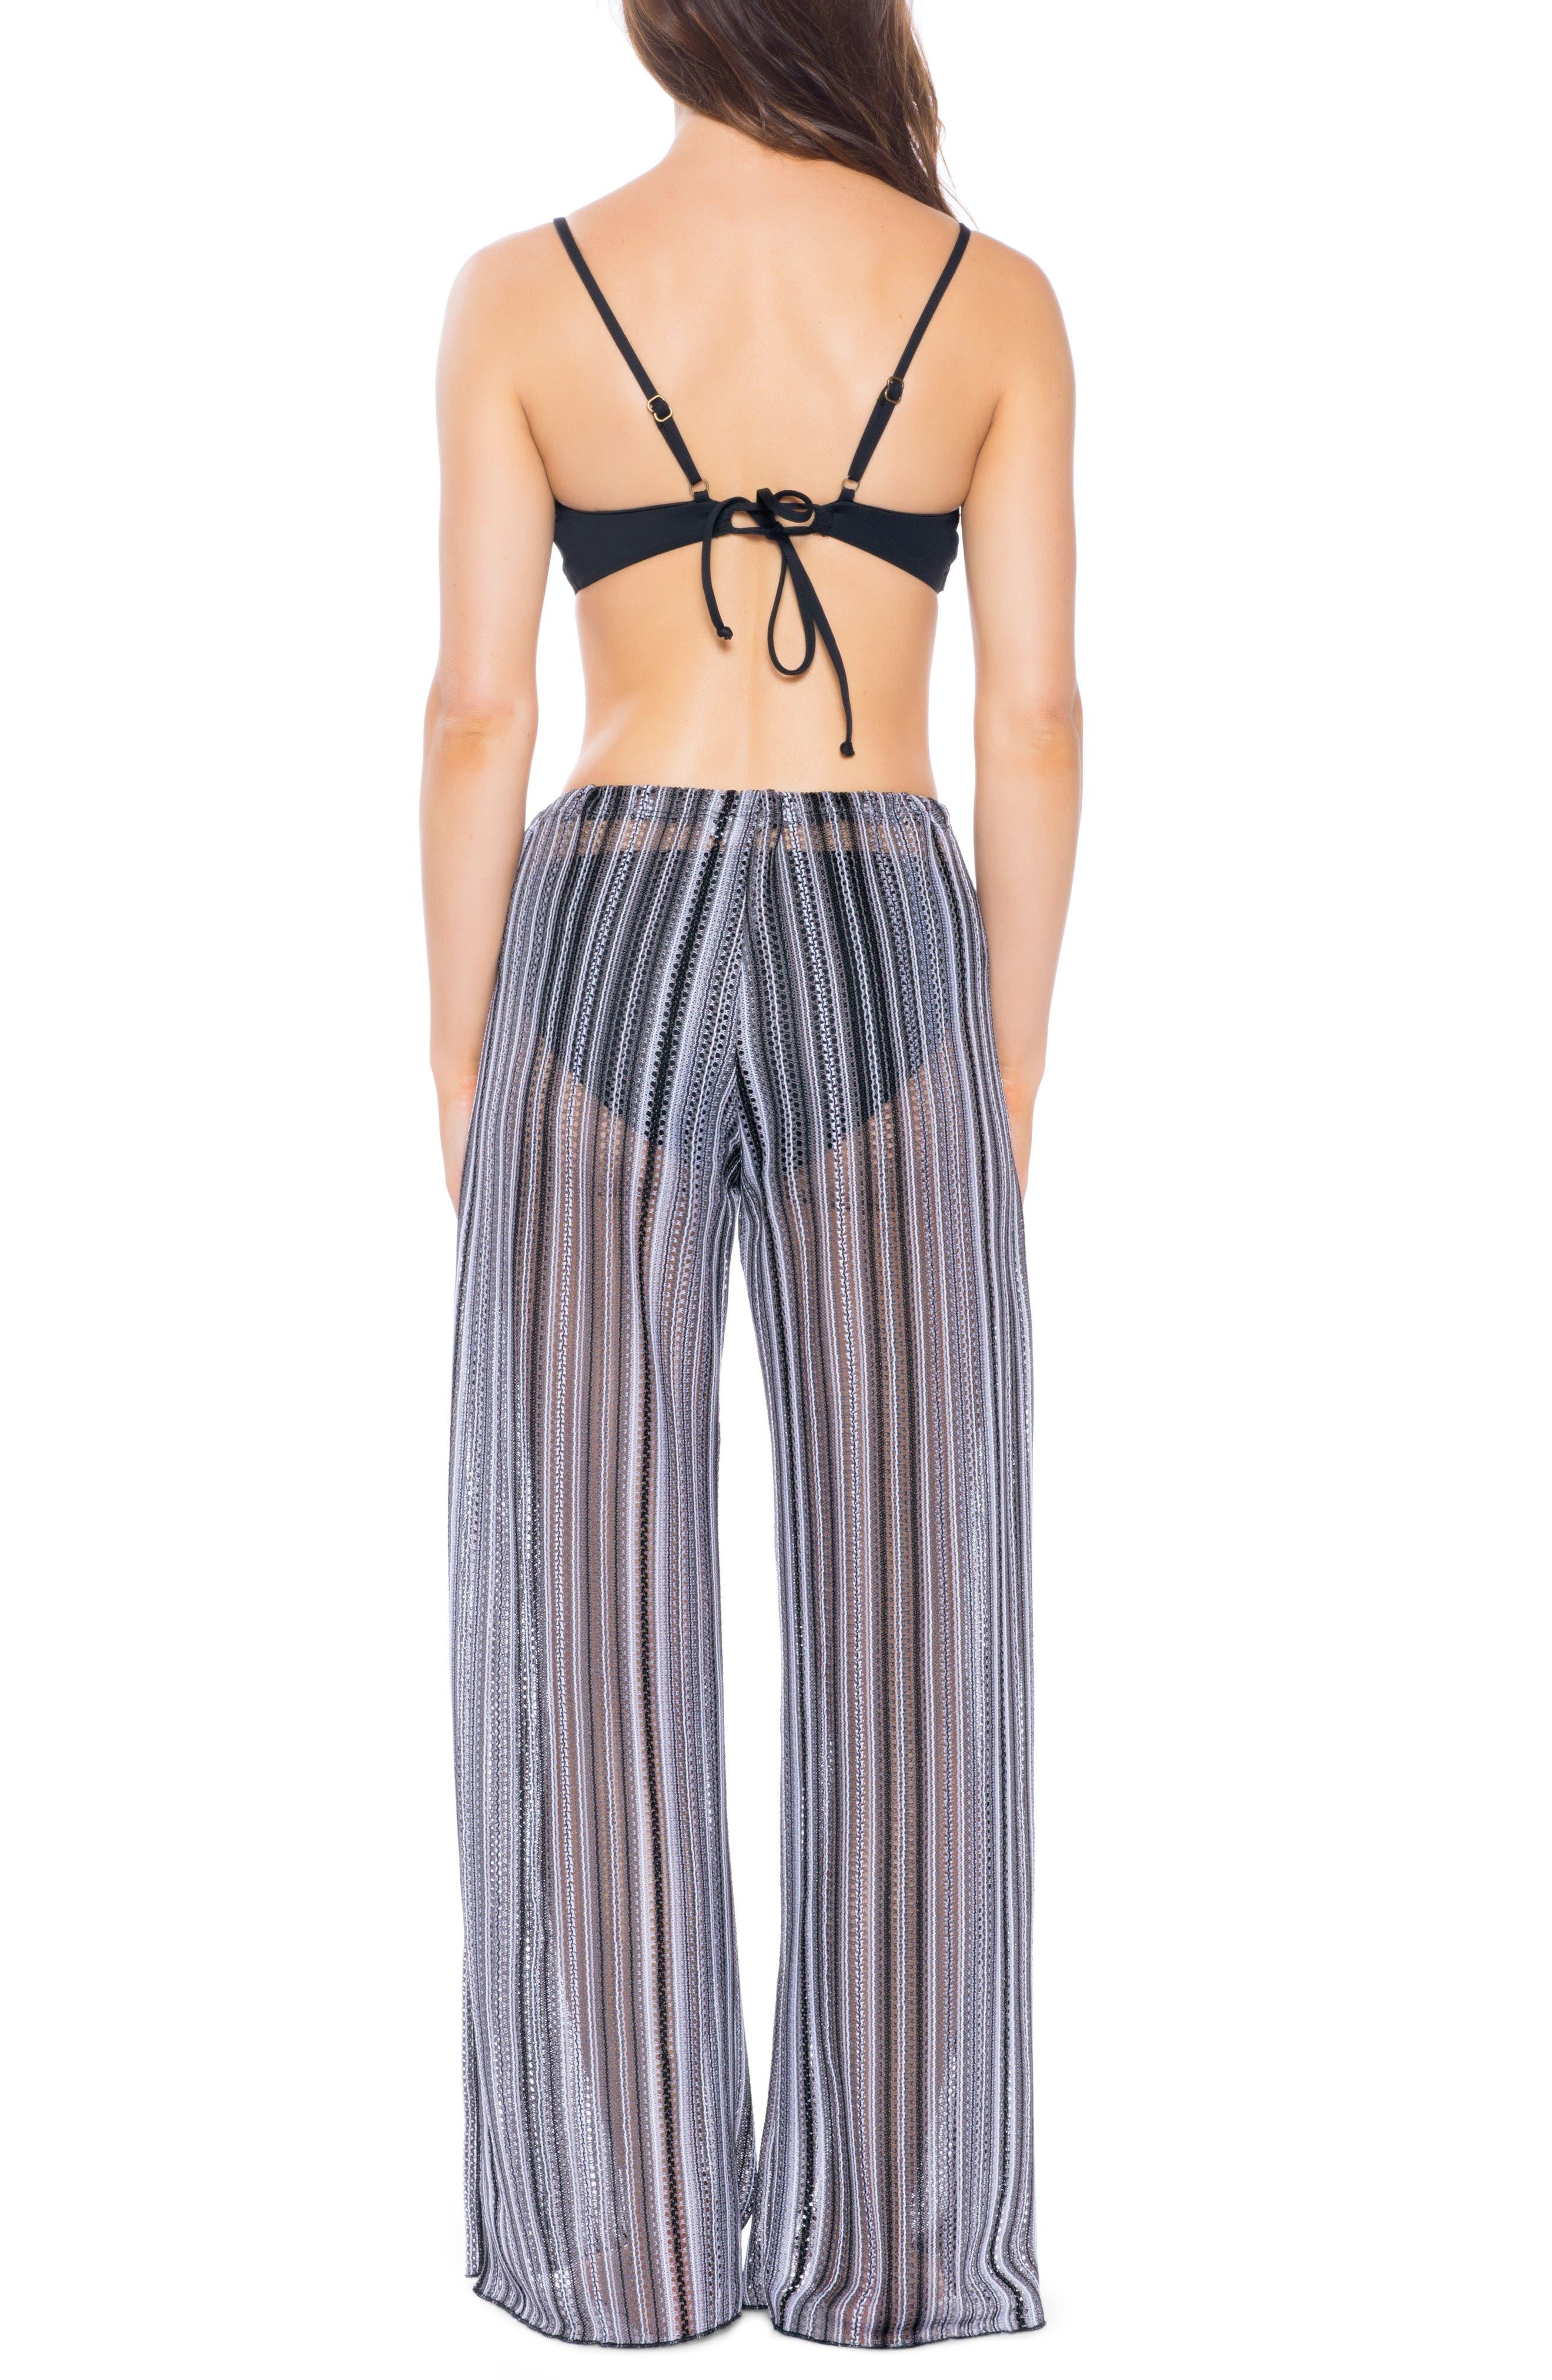 BECCA, Pierside Cover-Up Flyaway Pants, Alternate thumbnail 2, color, BLACK